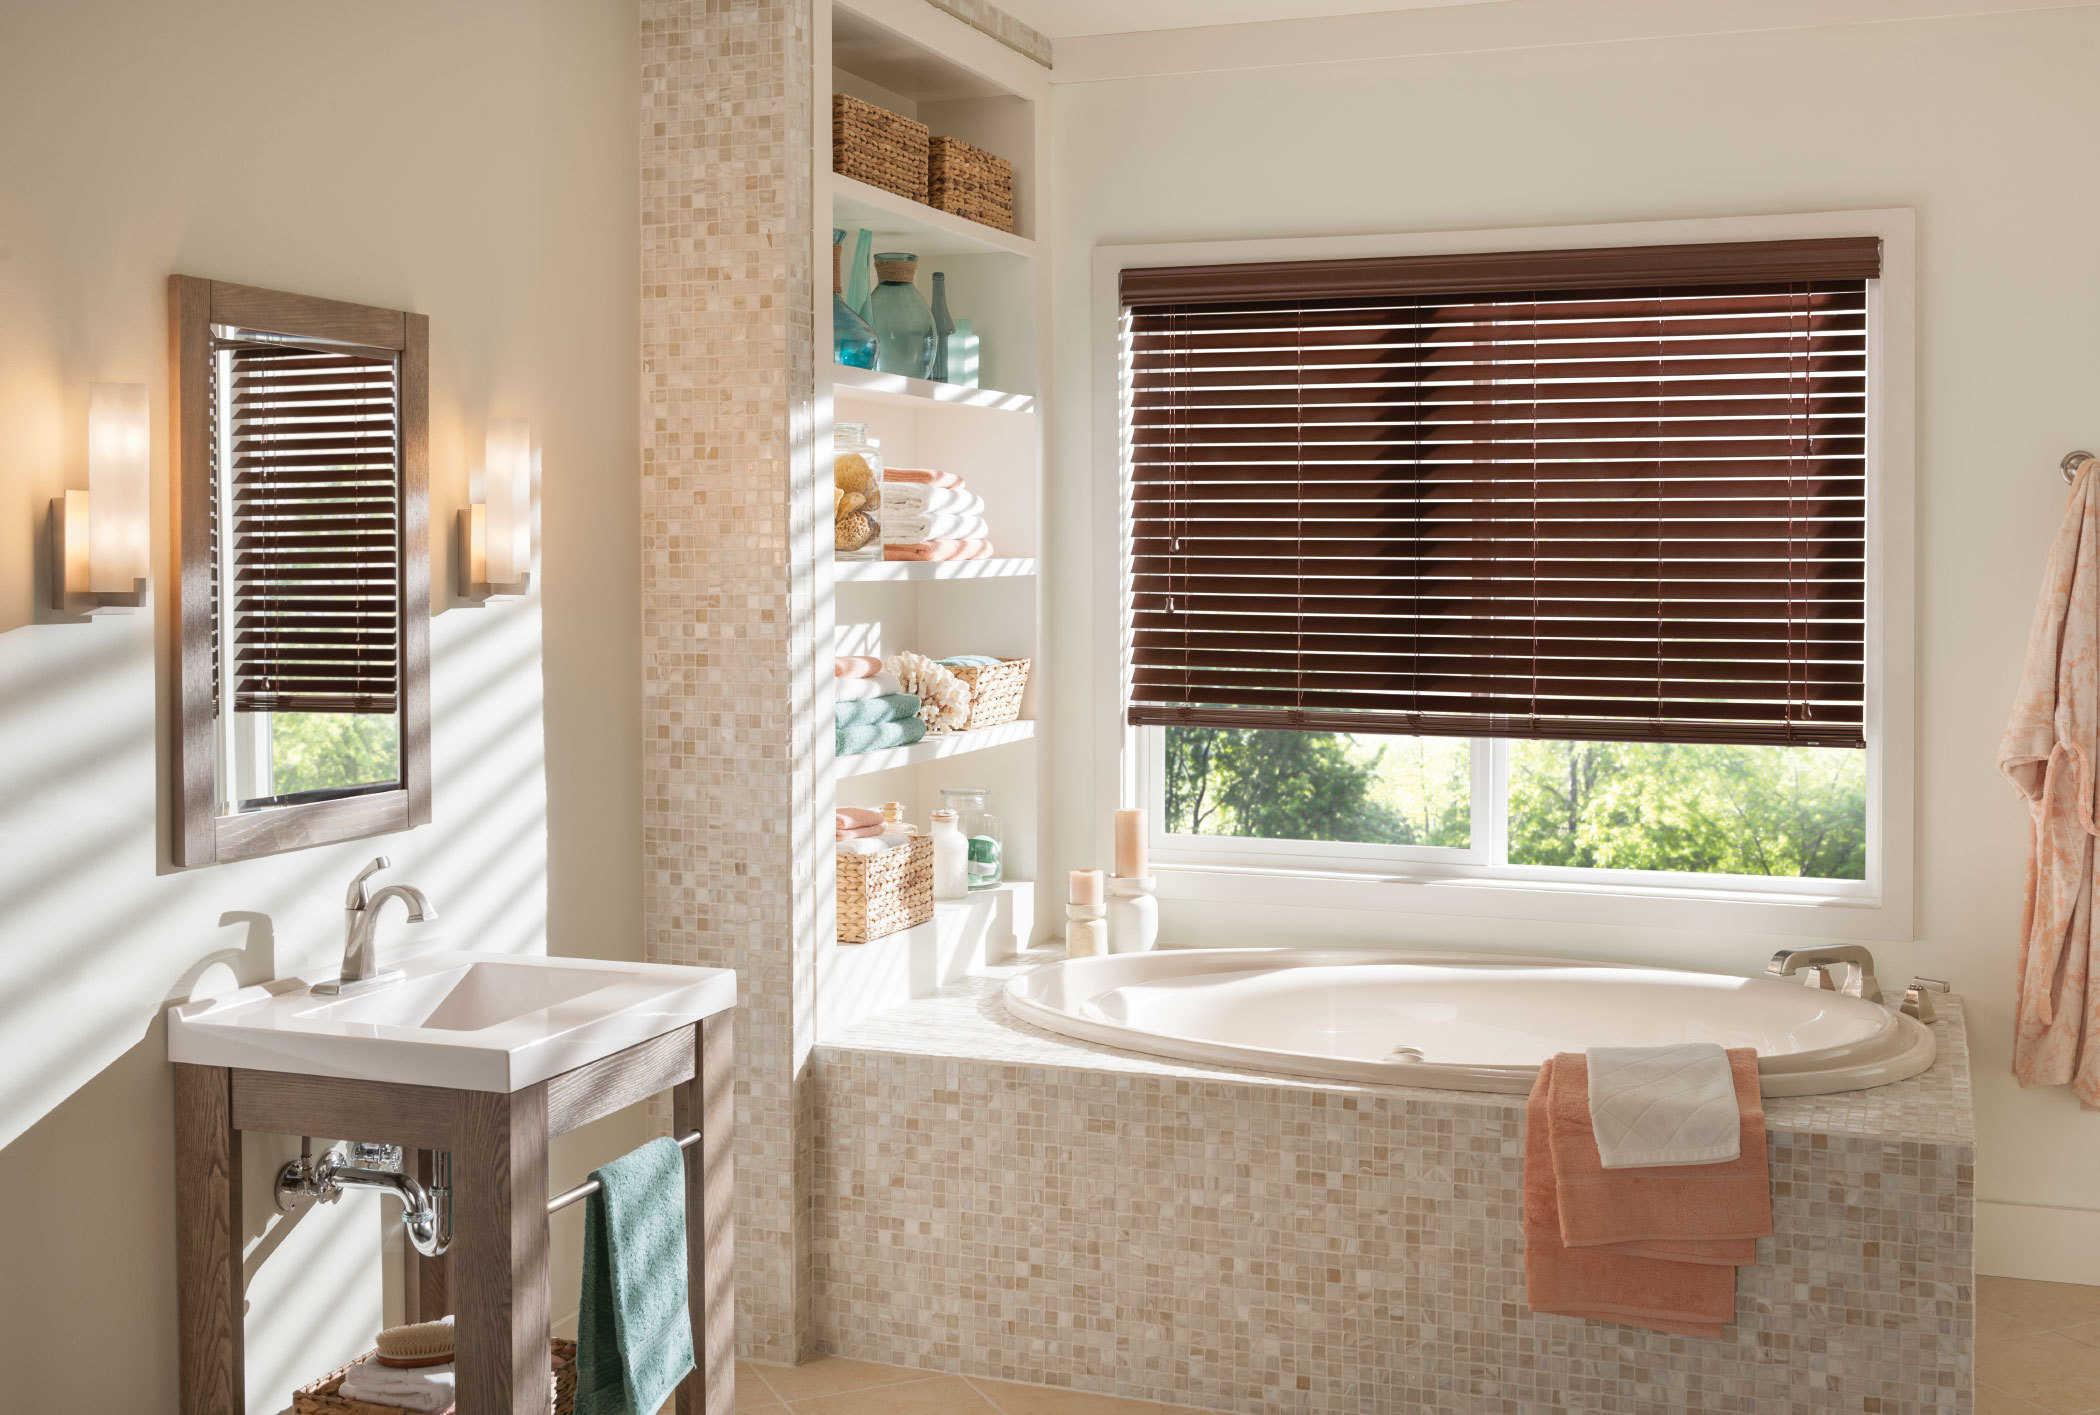 window blinds ideas modern freshome treatment coverings bathroom